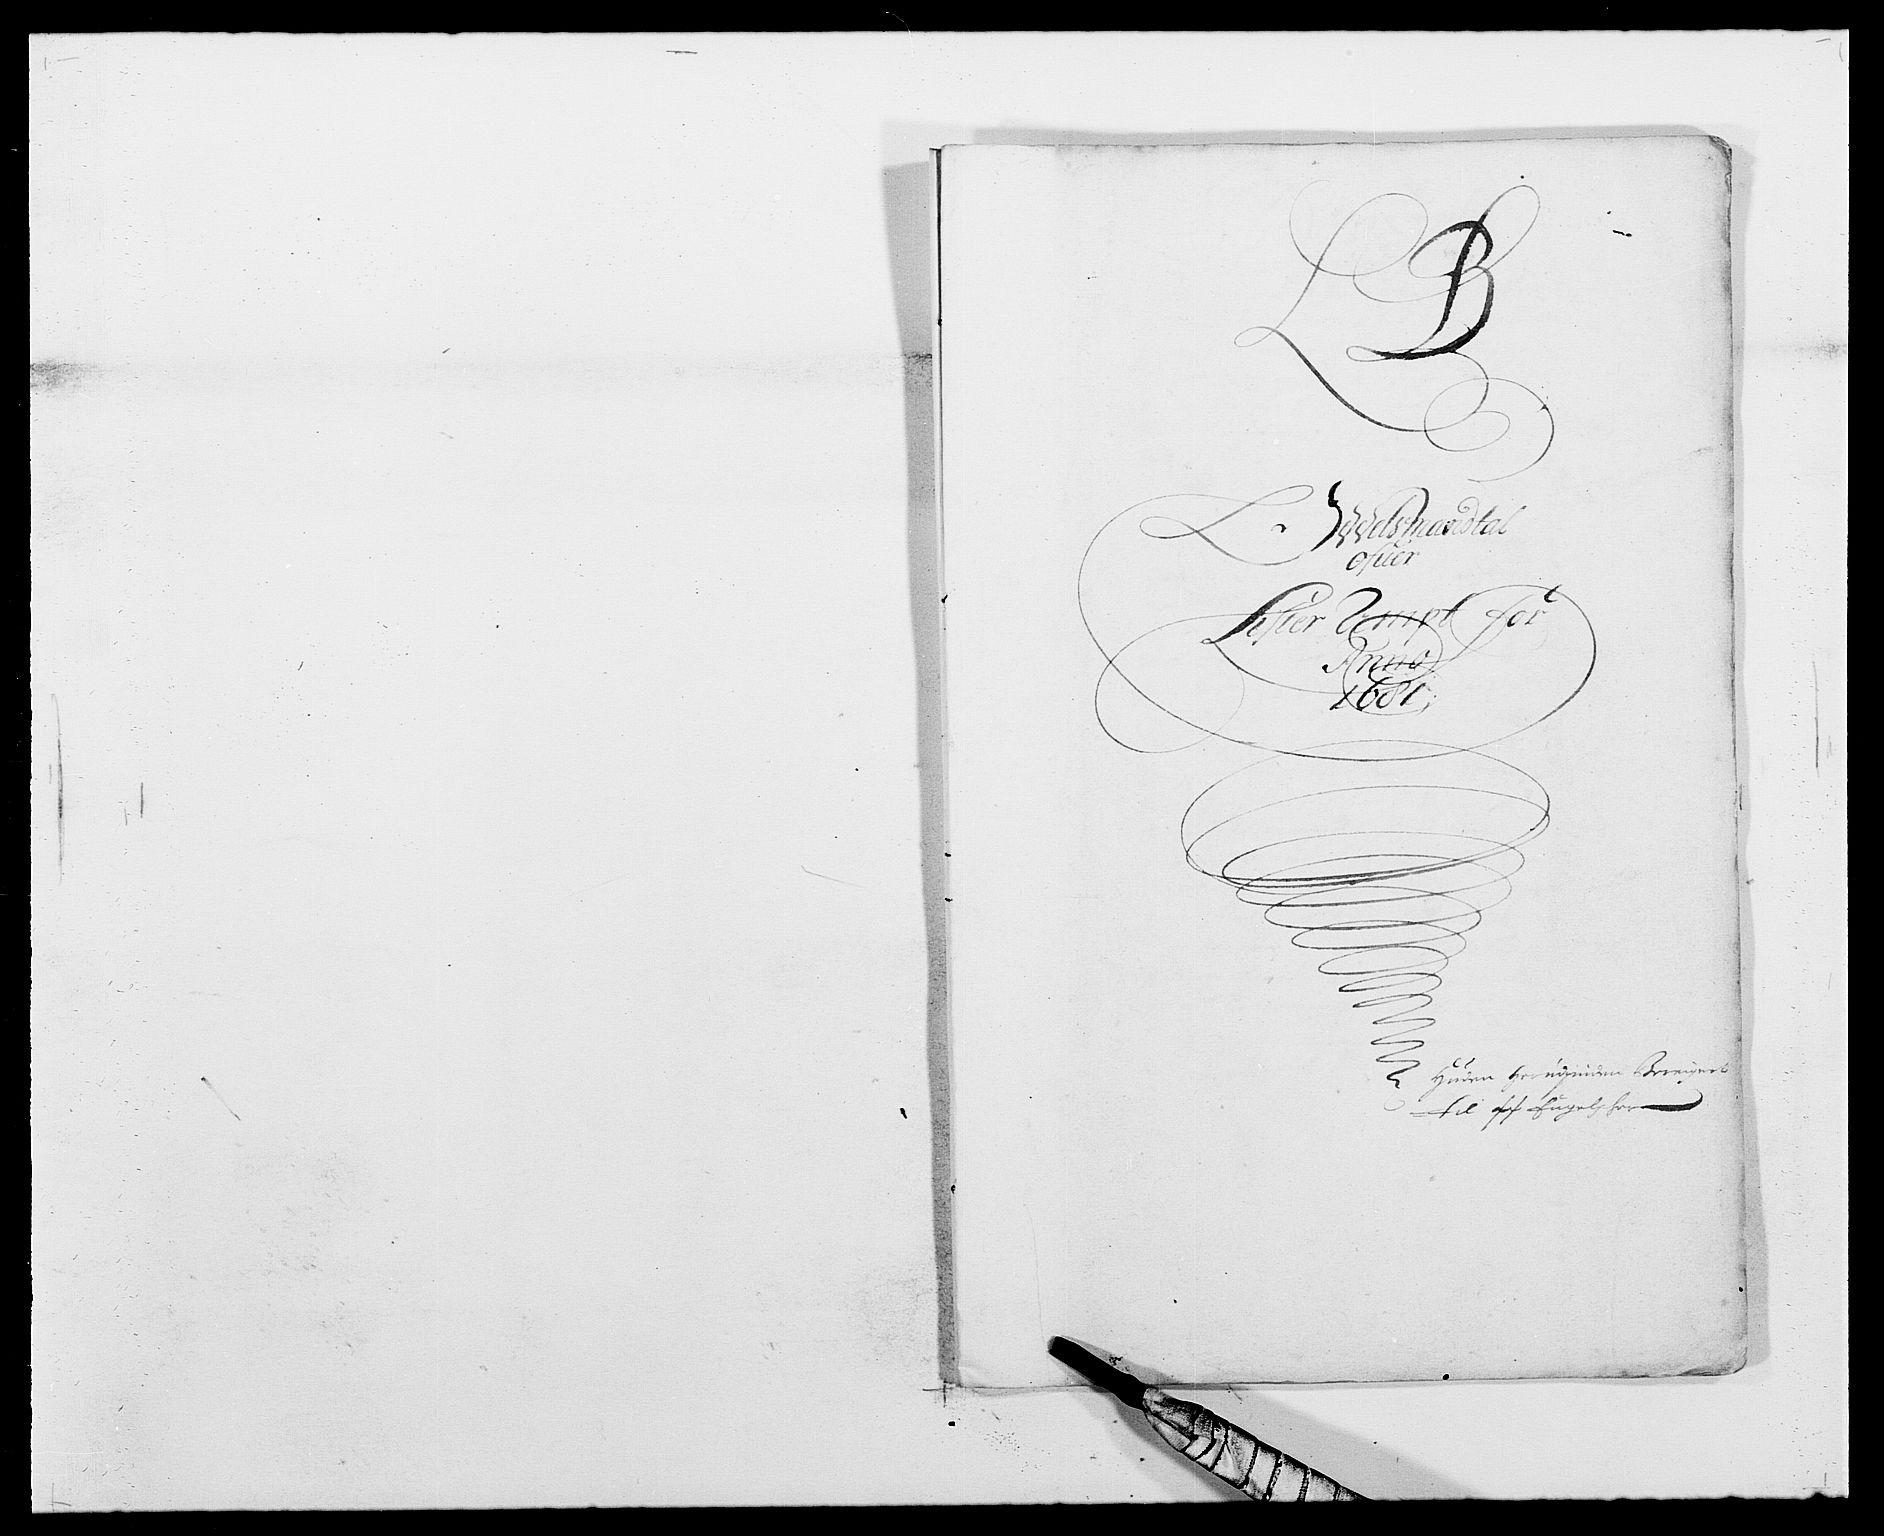 RA, Rentekammeret inntil 1814, Reviderte regnskaper, Fogderegnskap, R41/L2531: Fogderegnskap Lista, 1680-1682, s. 117